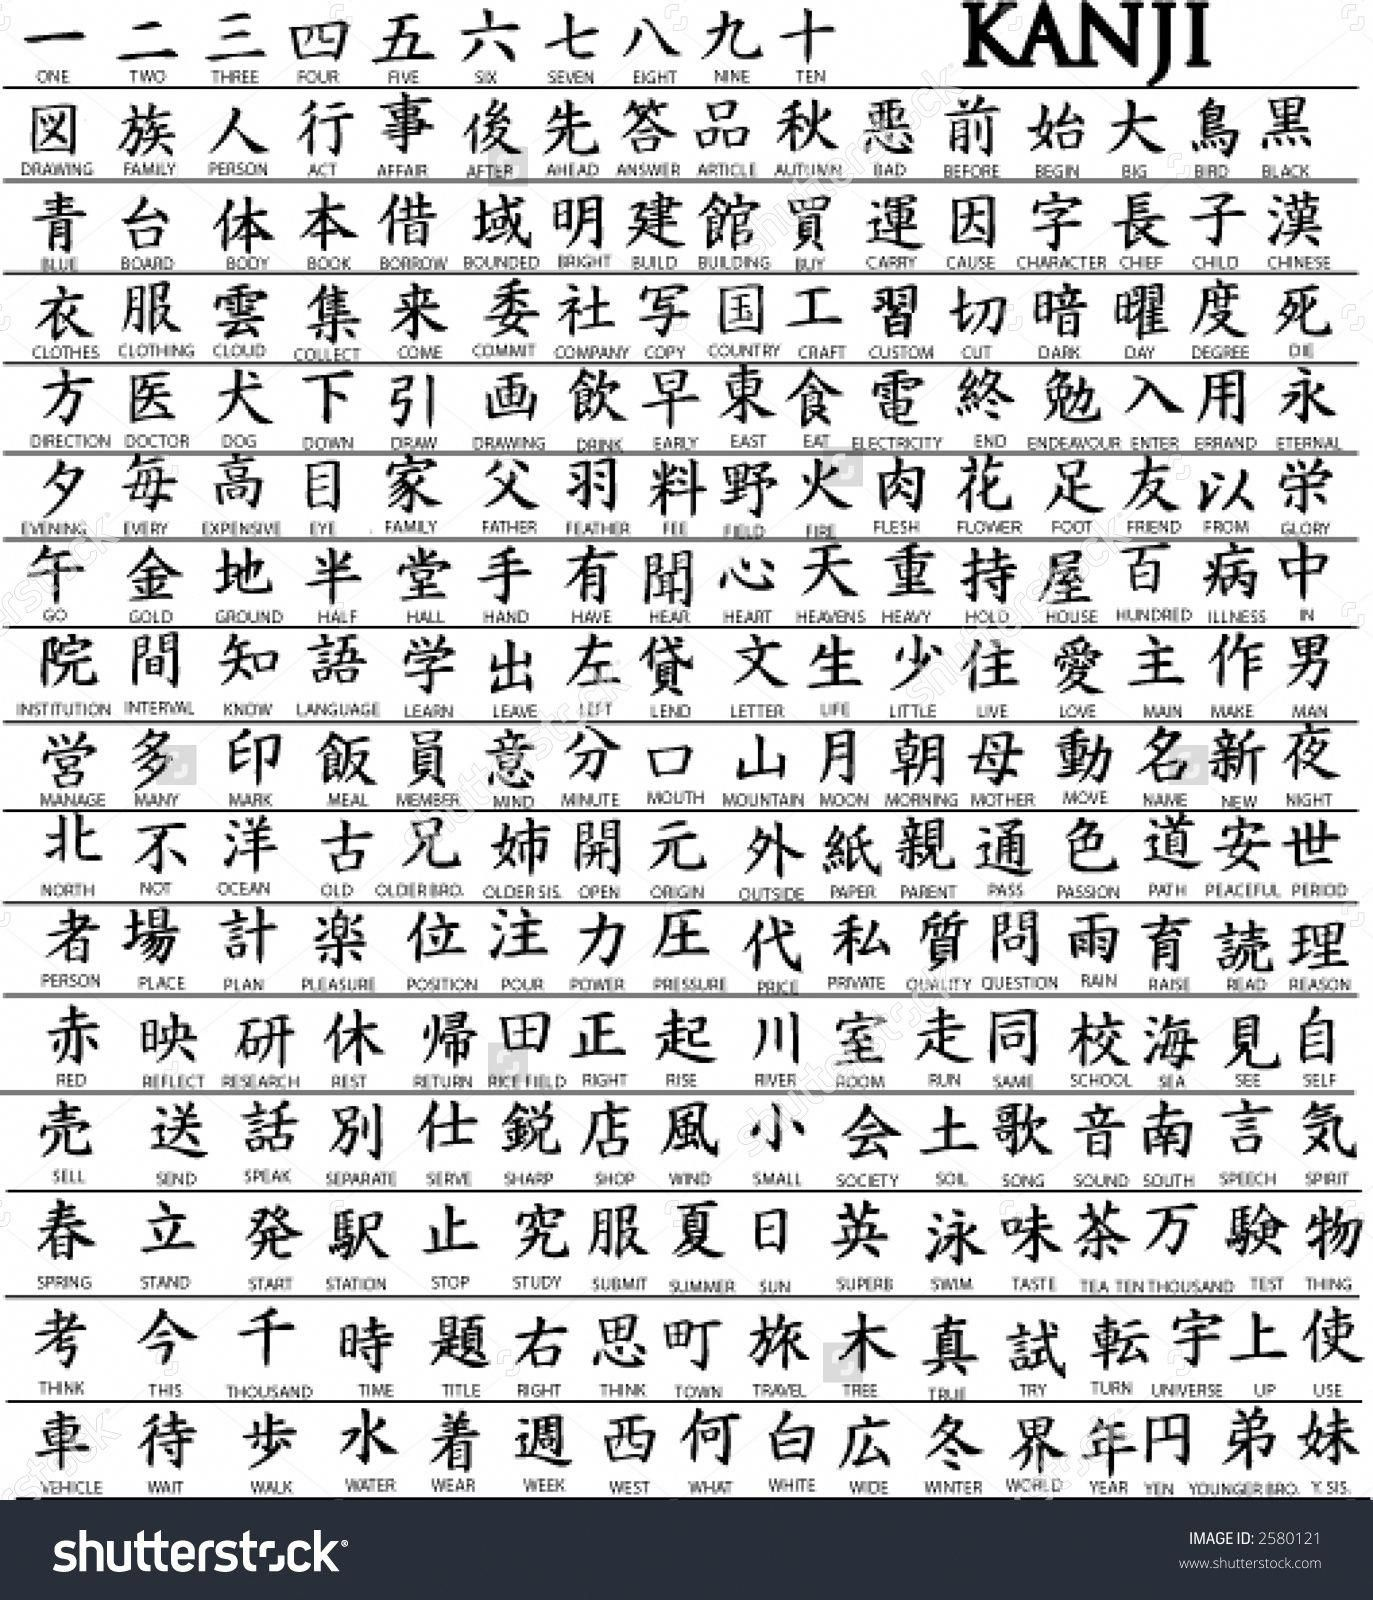 list of 100 kanji